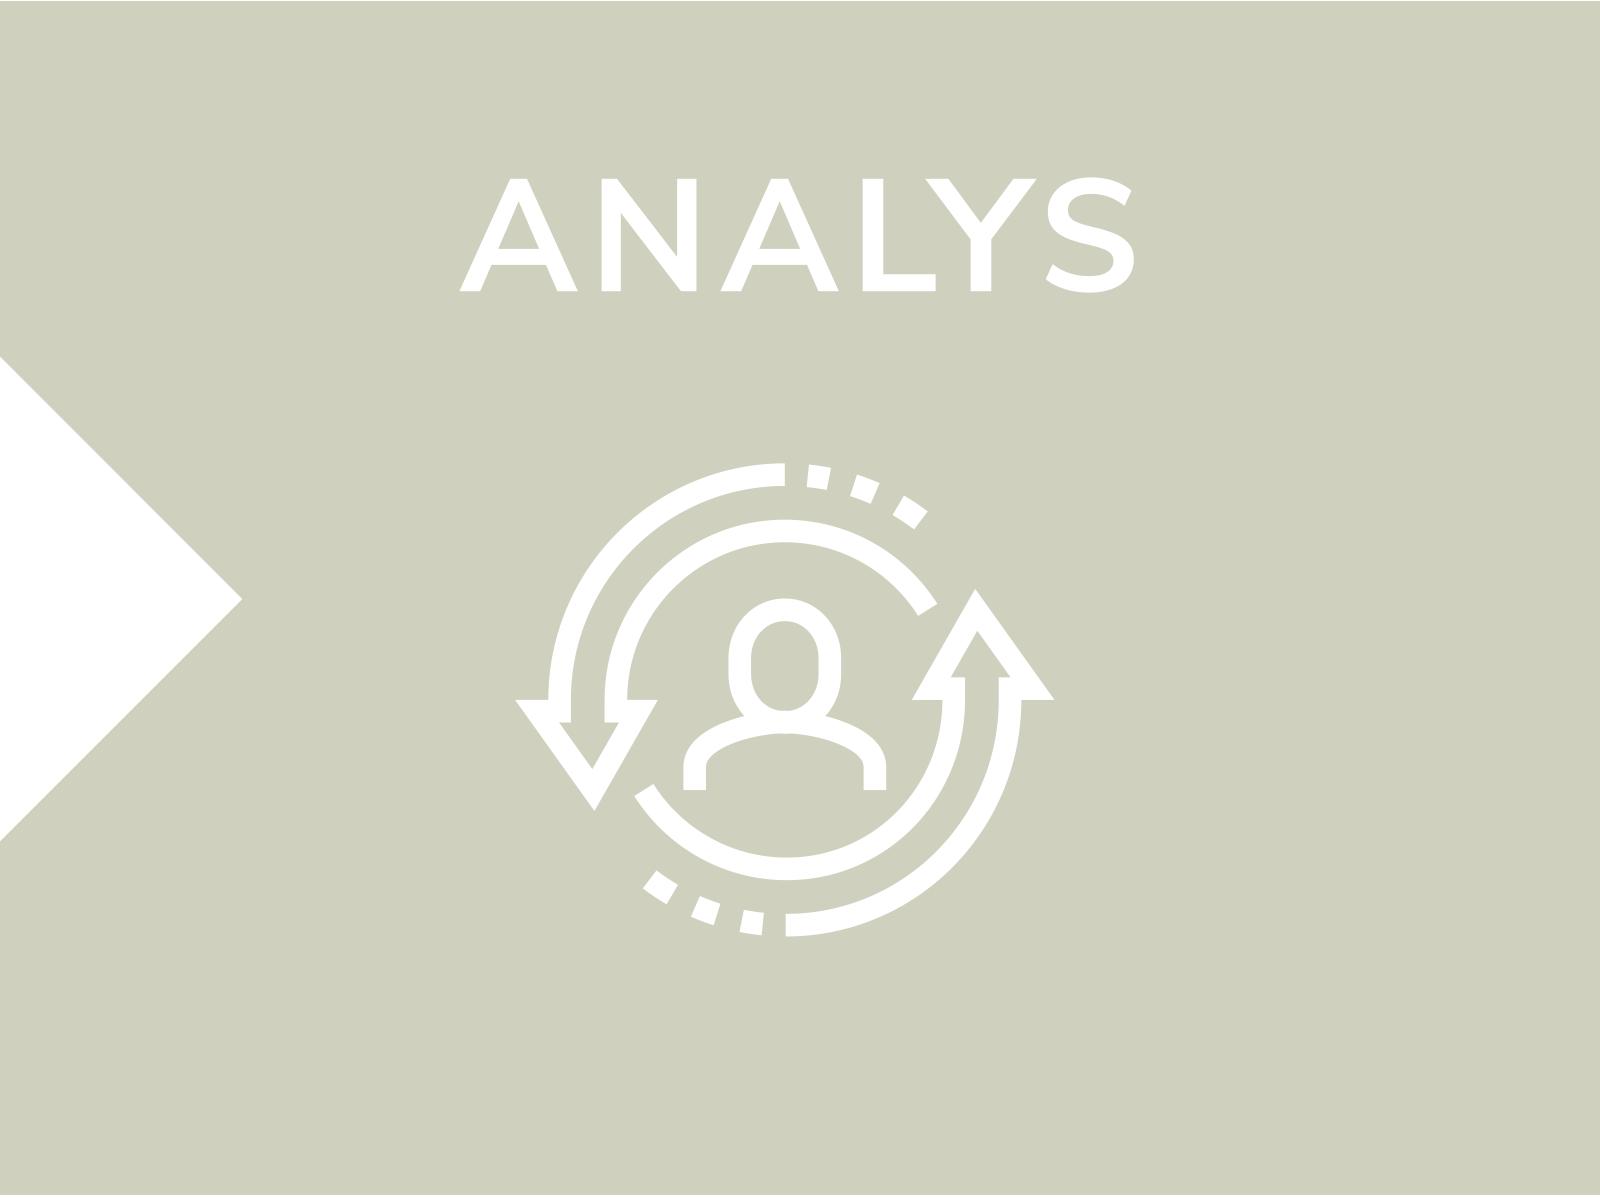 Process-analys